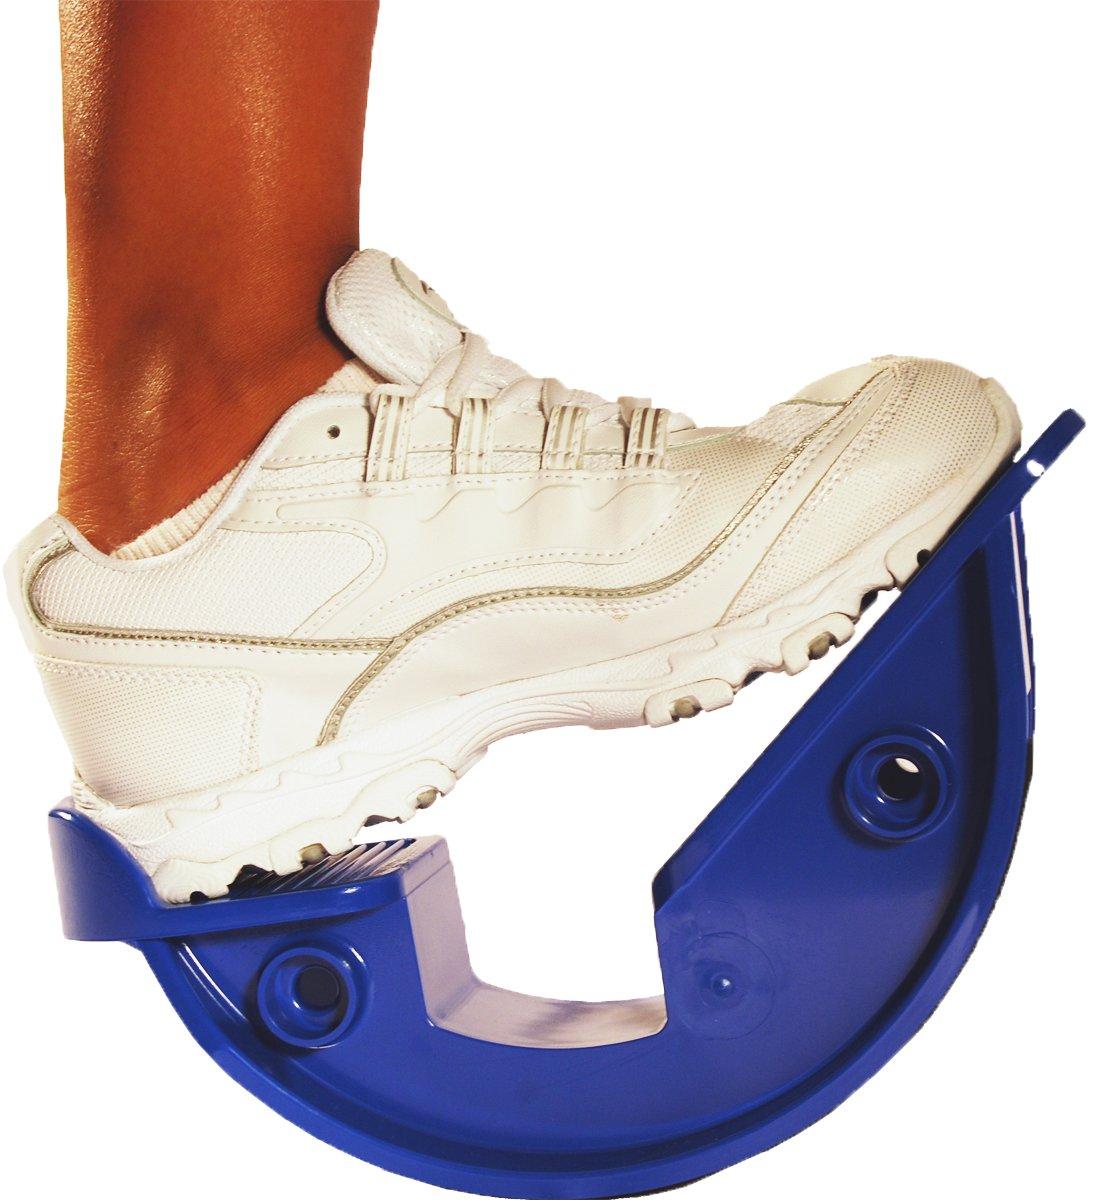 ProStretch ''Blue'' - The Original Calf Stretcher & Foot Rocker for Plantar Fasciitis, Achilles Tendonitis & Tight Calf Pain (Slip Resistant Bottom) by ProStretch